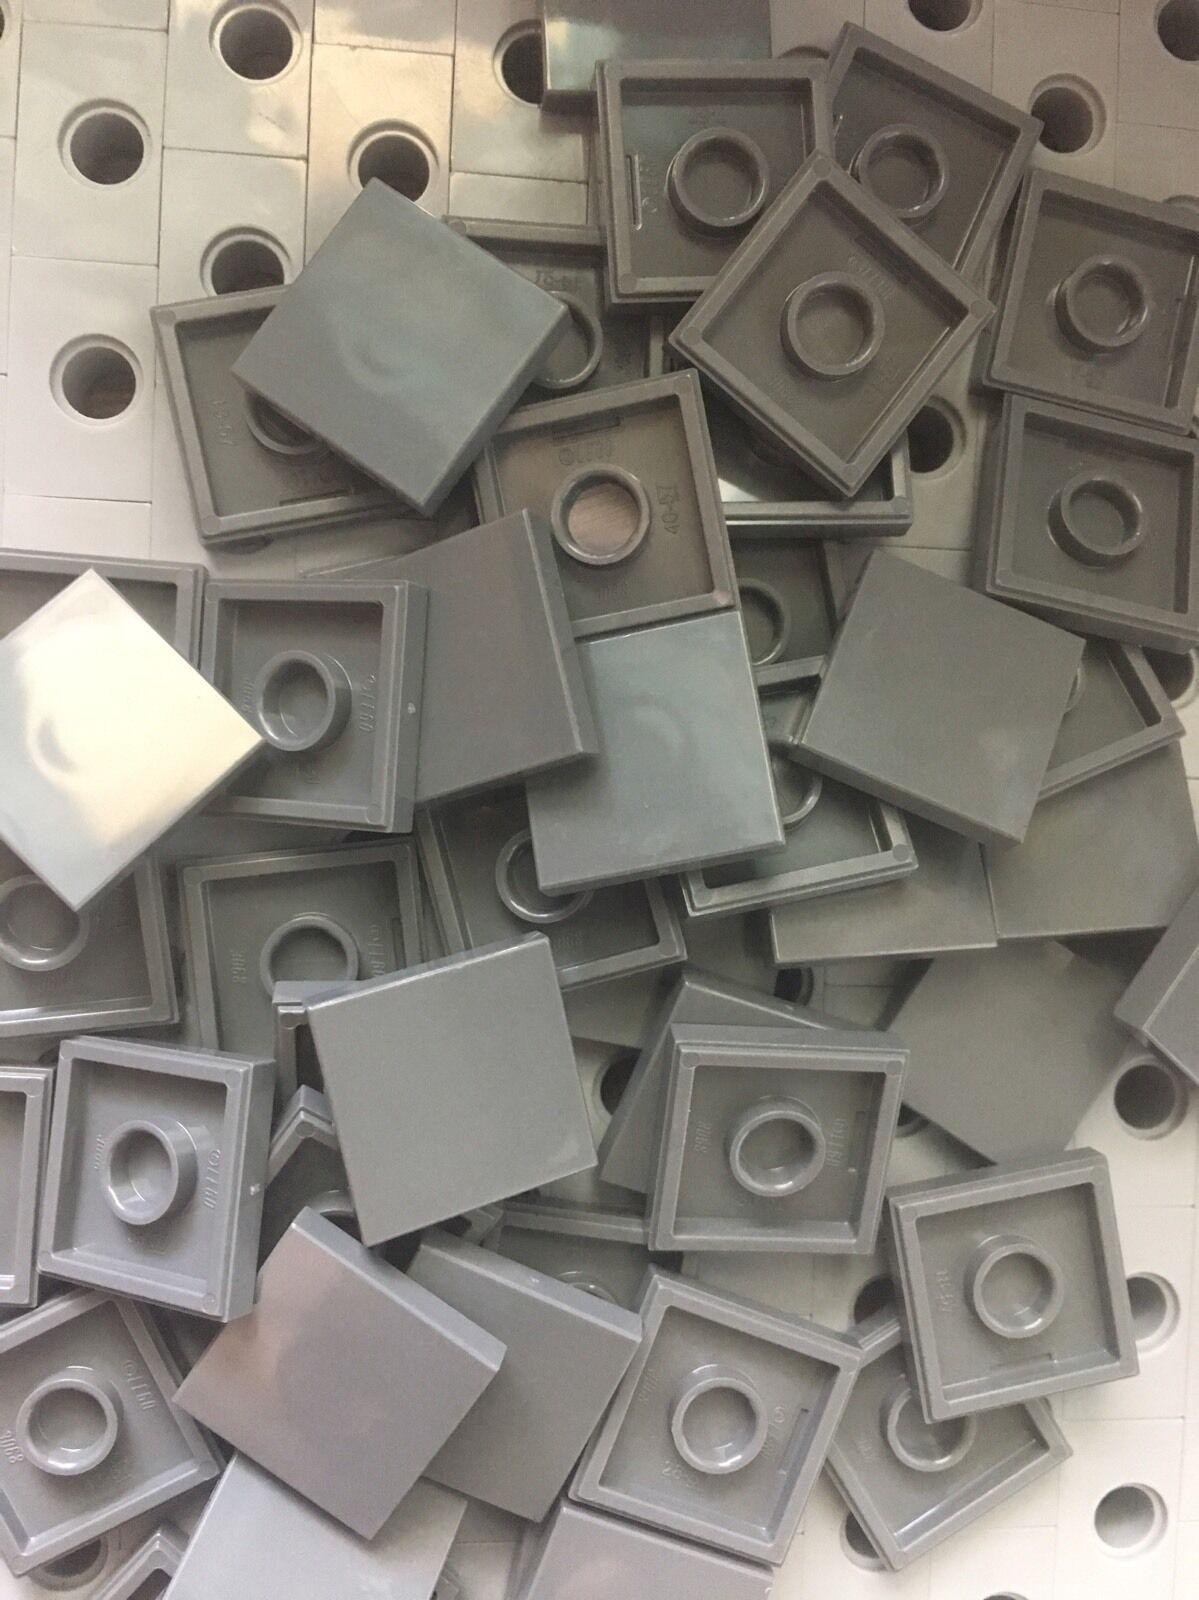 Lego Tile Medium Blue Flat 2x2 Tiles Smooth Finishing MODULAR BUILDINGS Floor 50